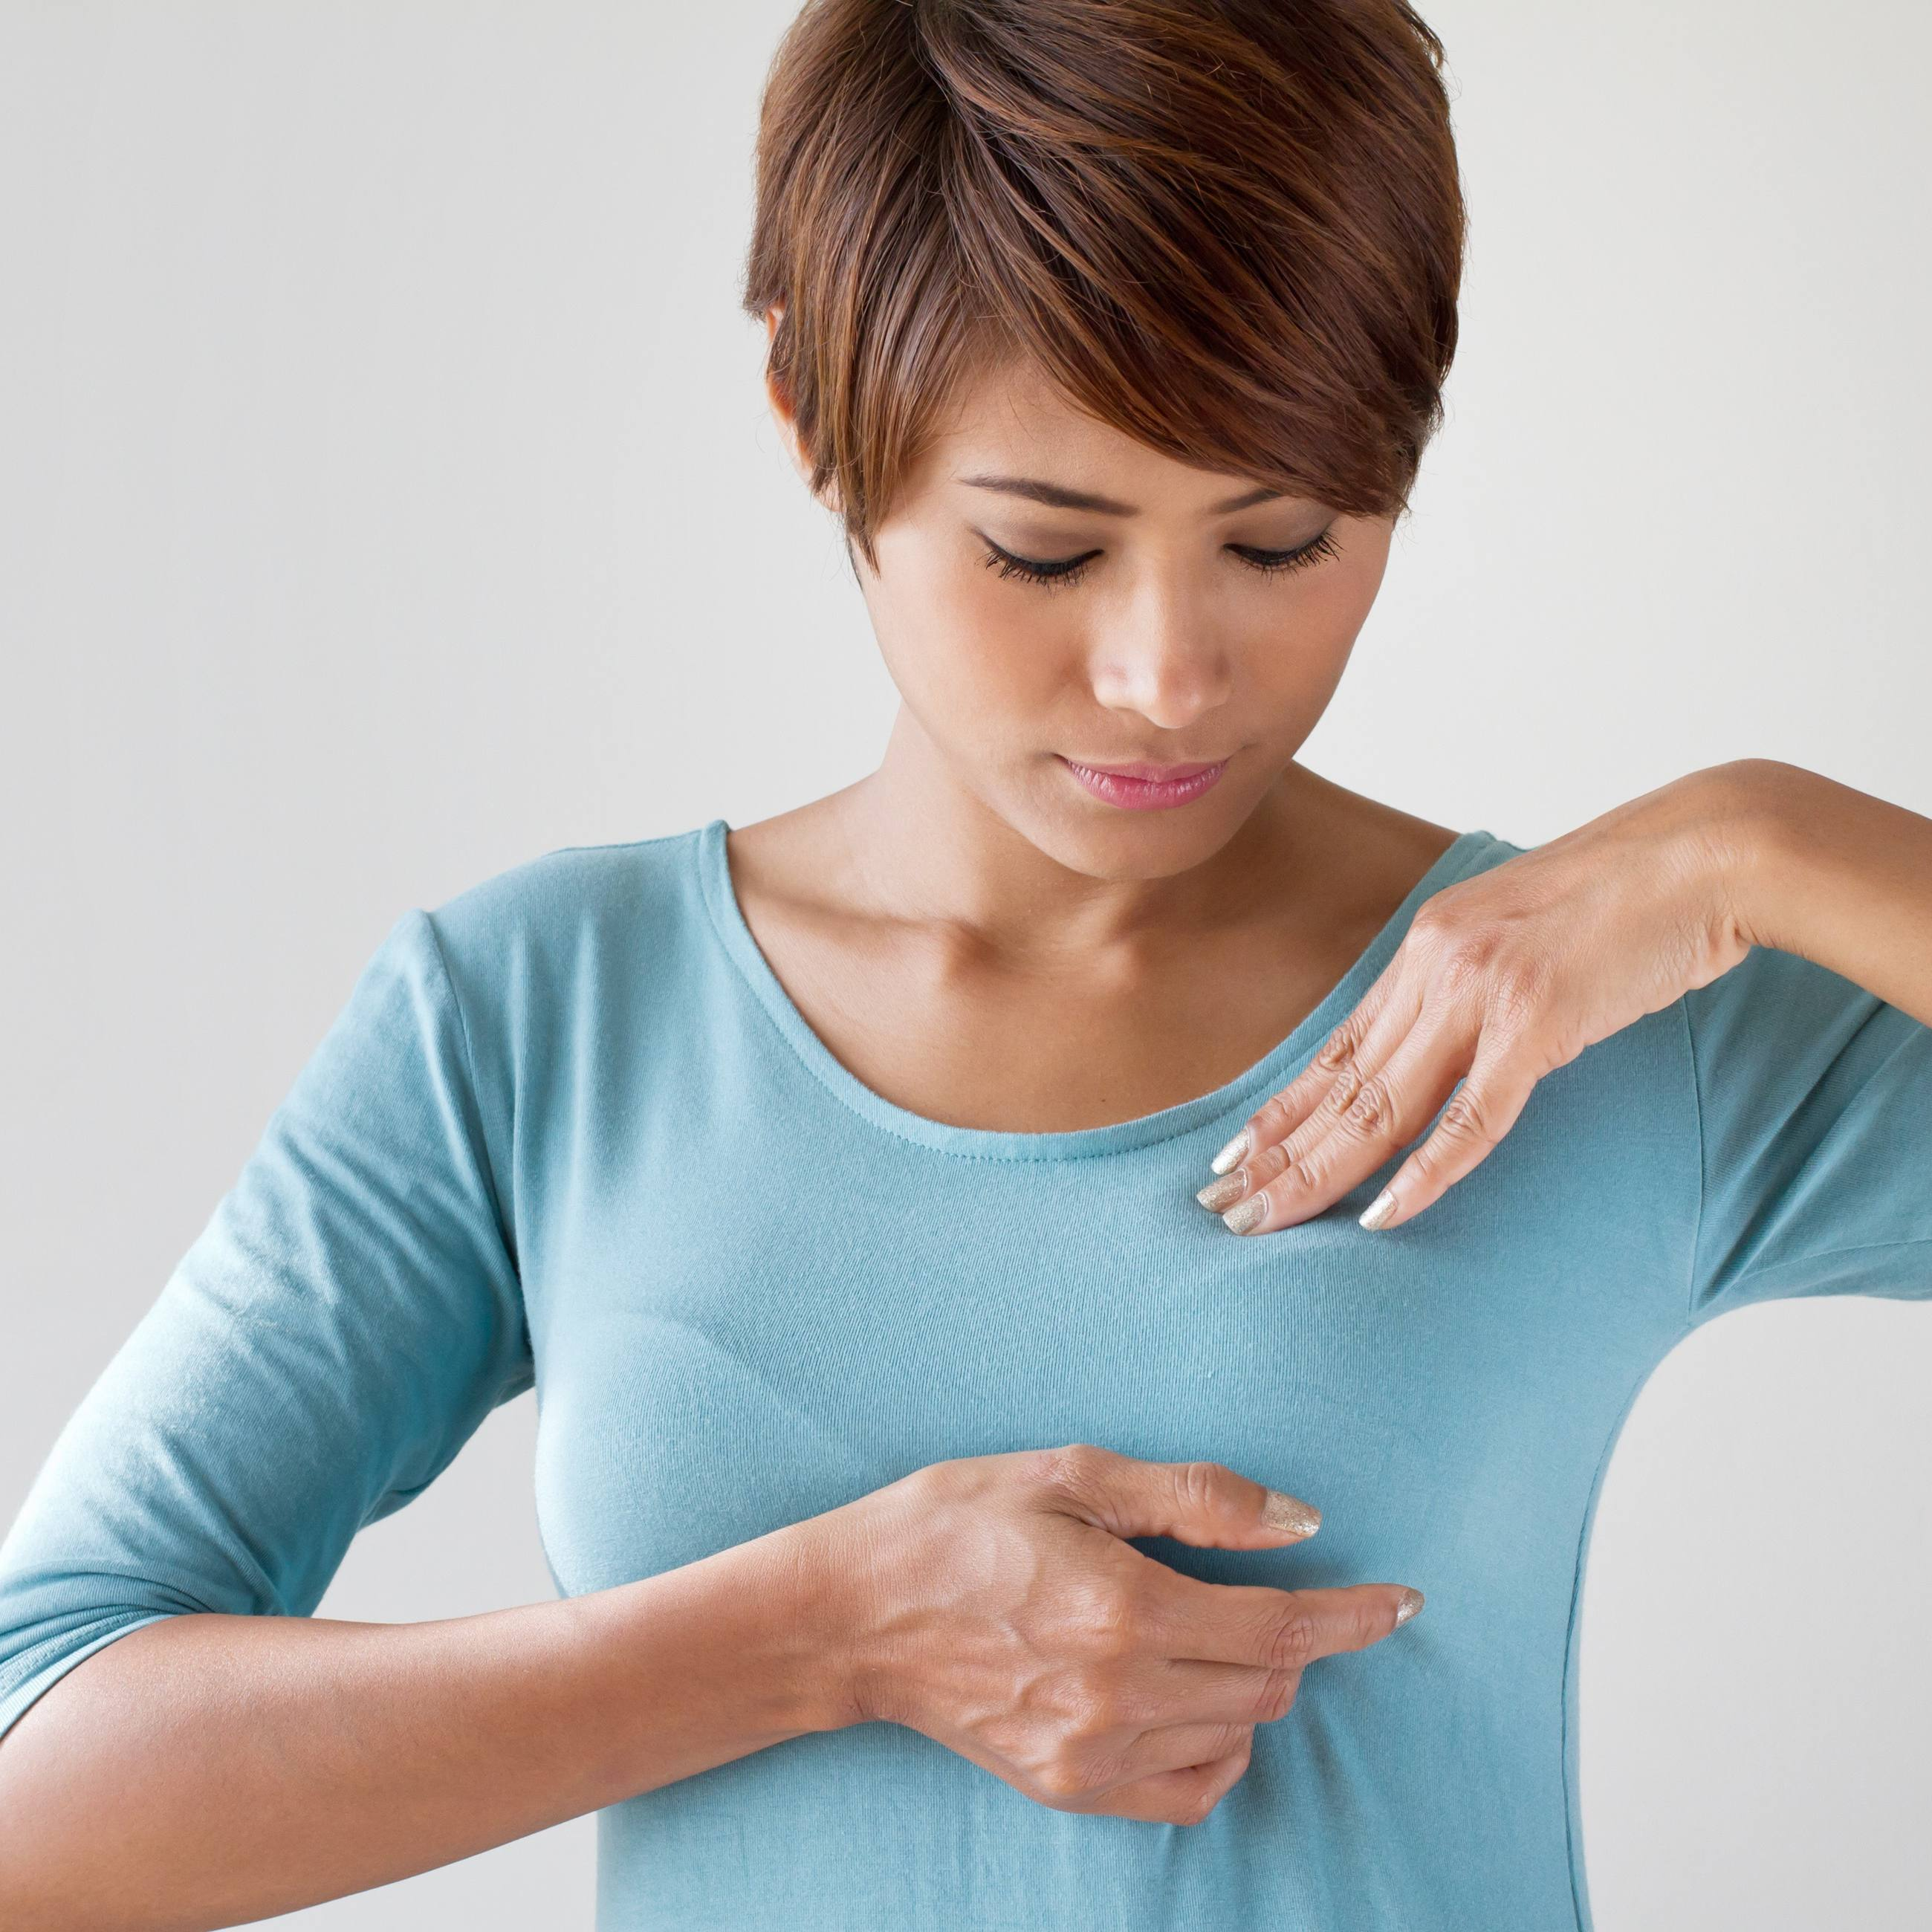 Woman wearing blue shirt doing breast self-examination